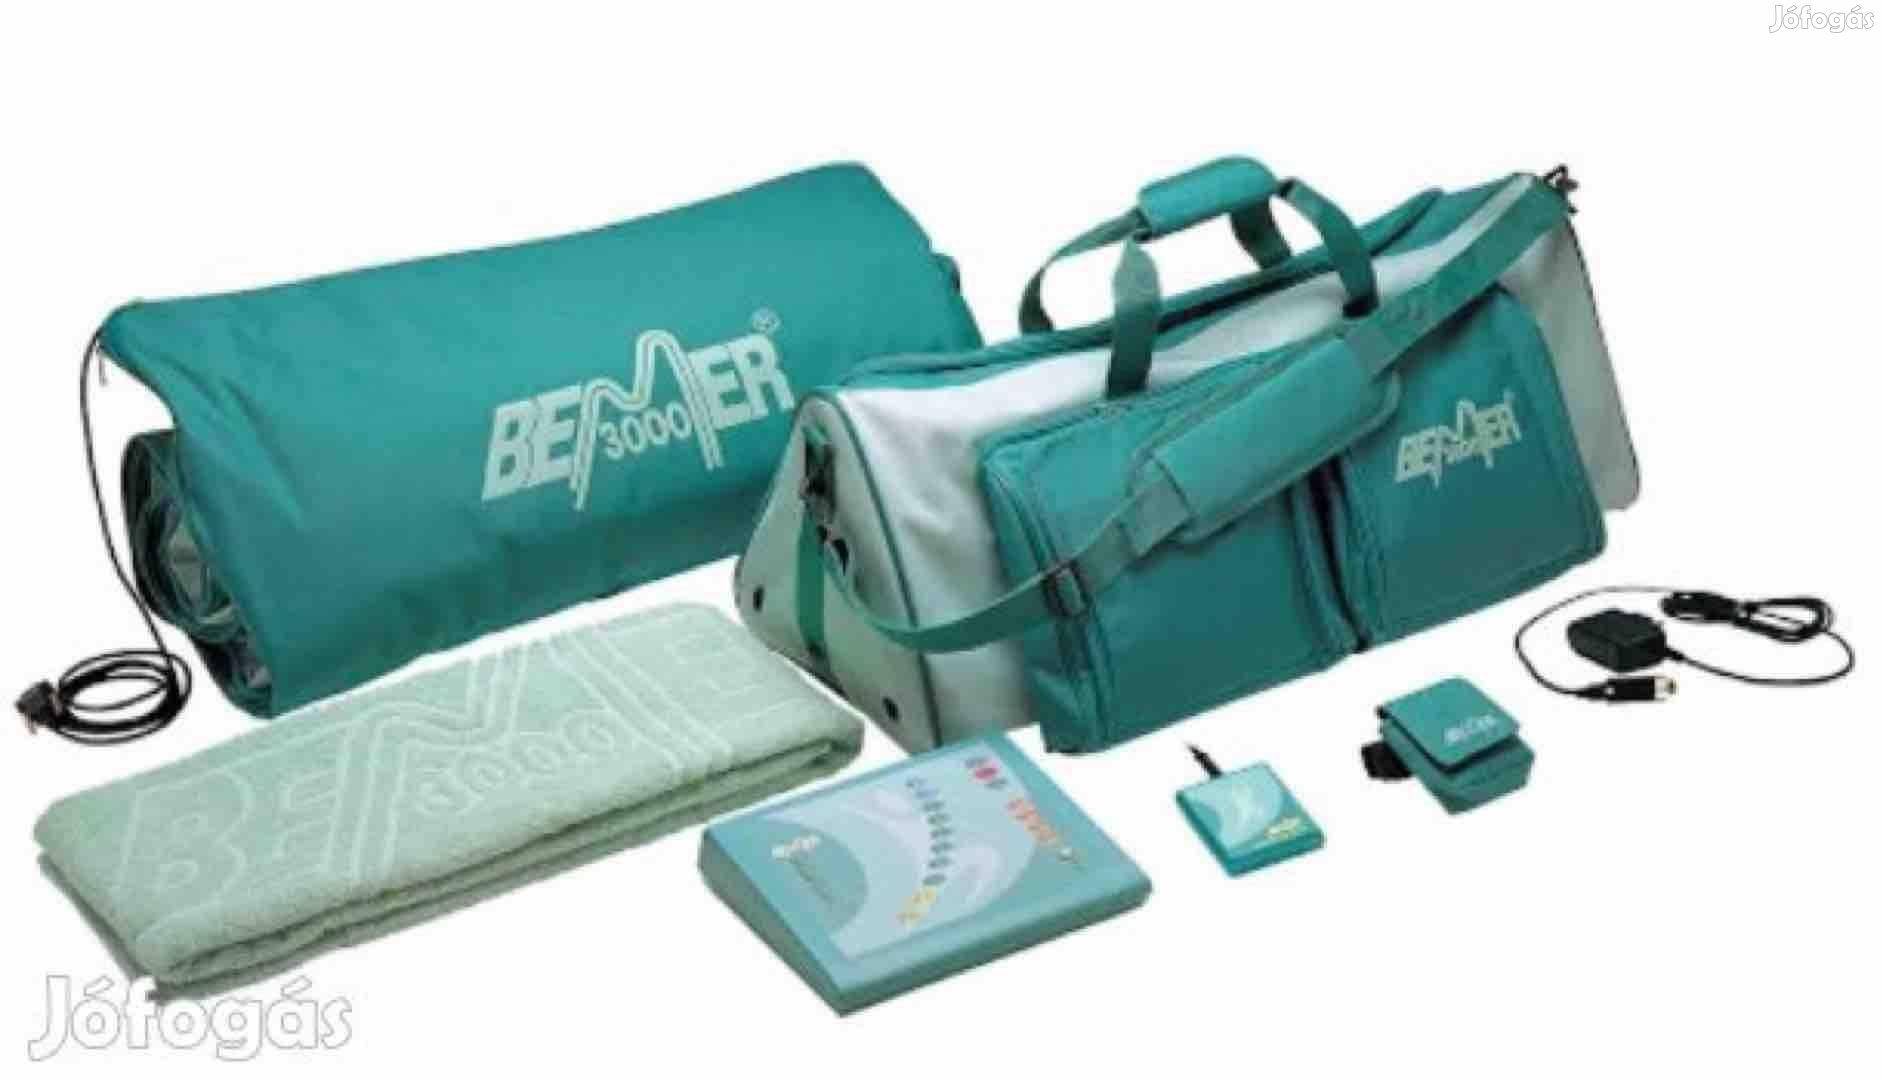 Keresek: Bemer Classic Set,Bemer Professional Set,Bemer 3000 vétele,06205619865